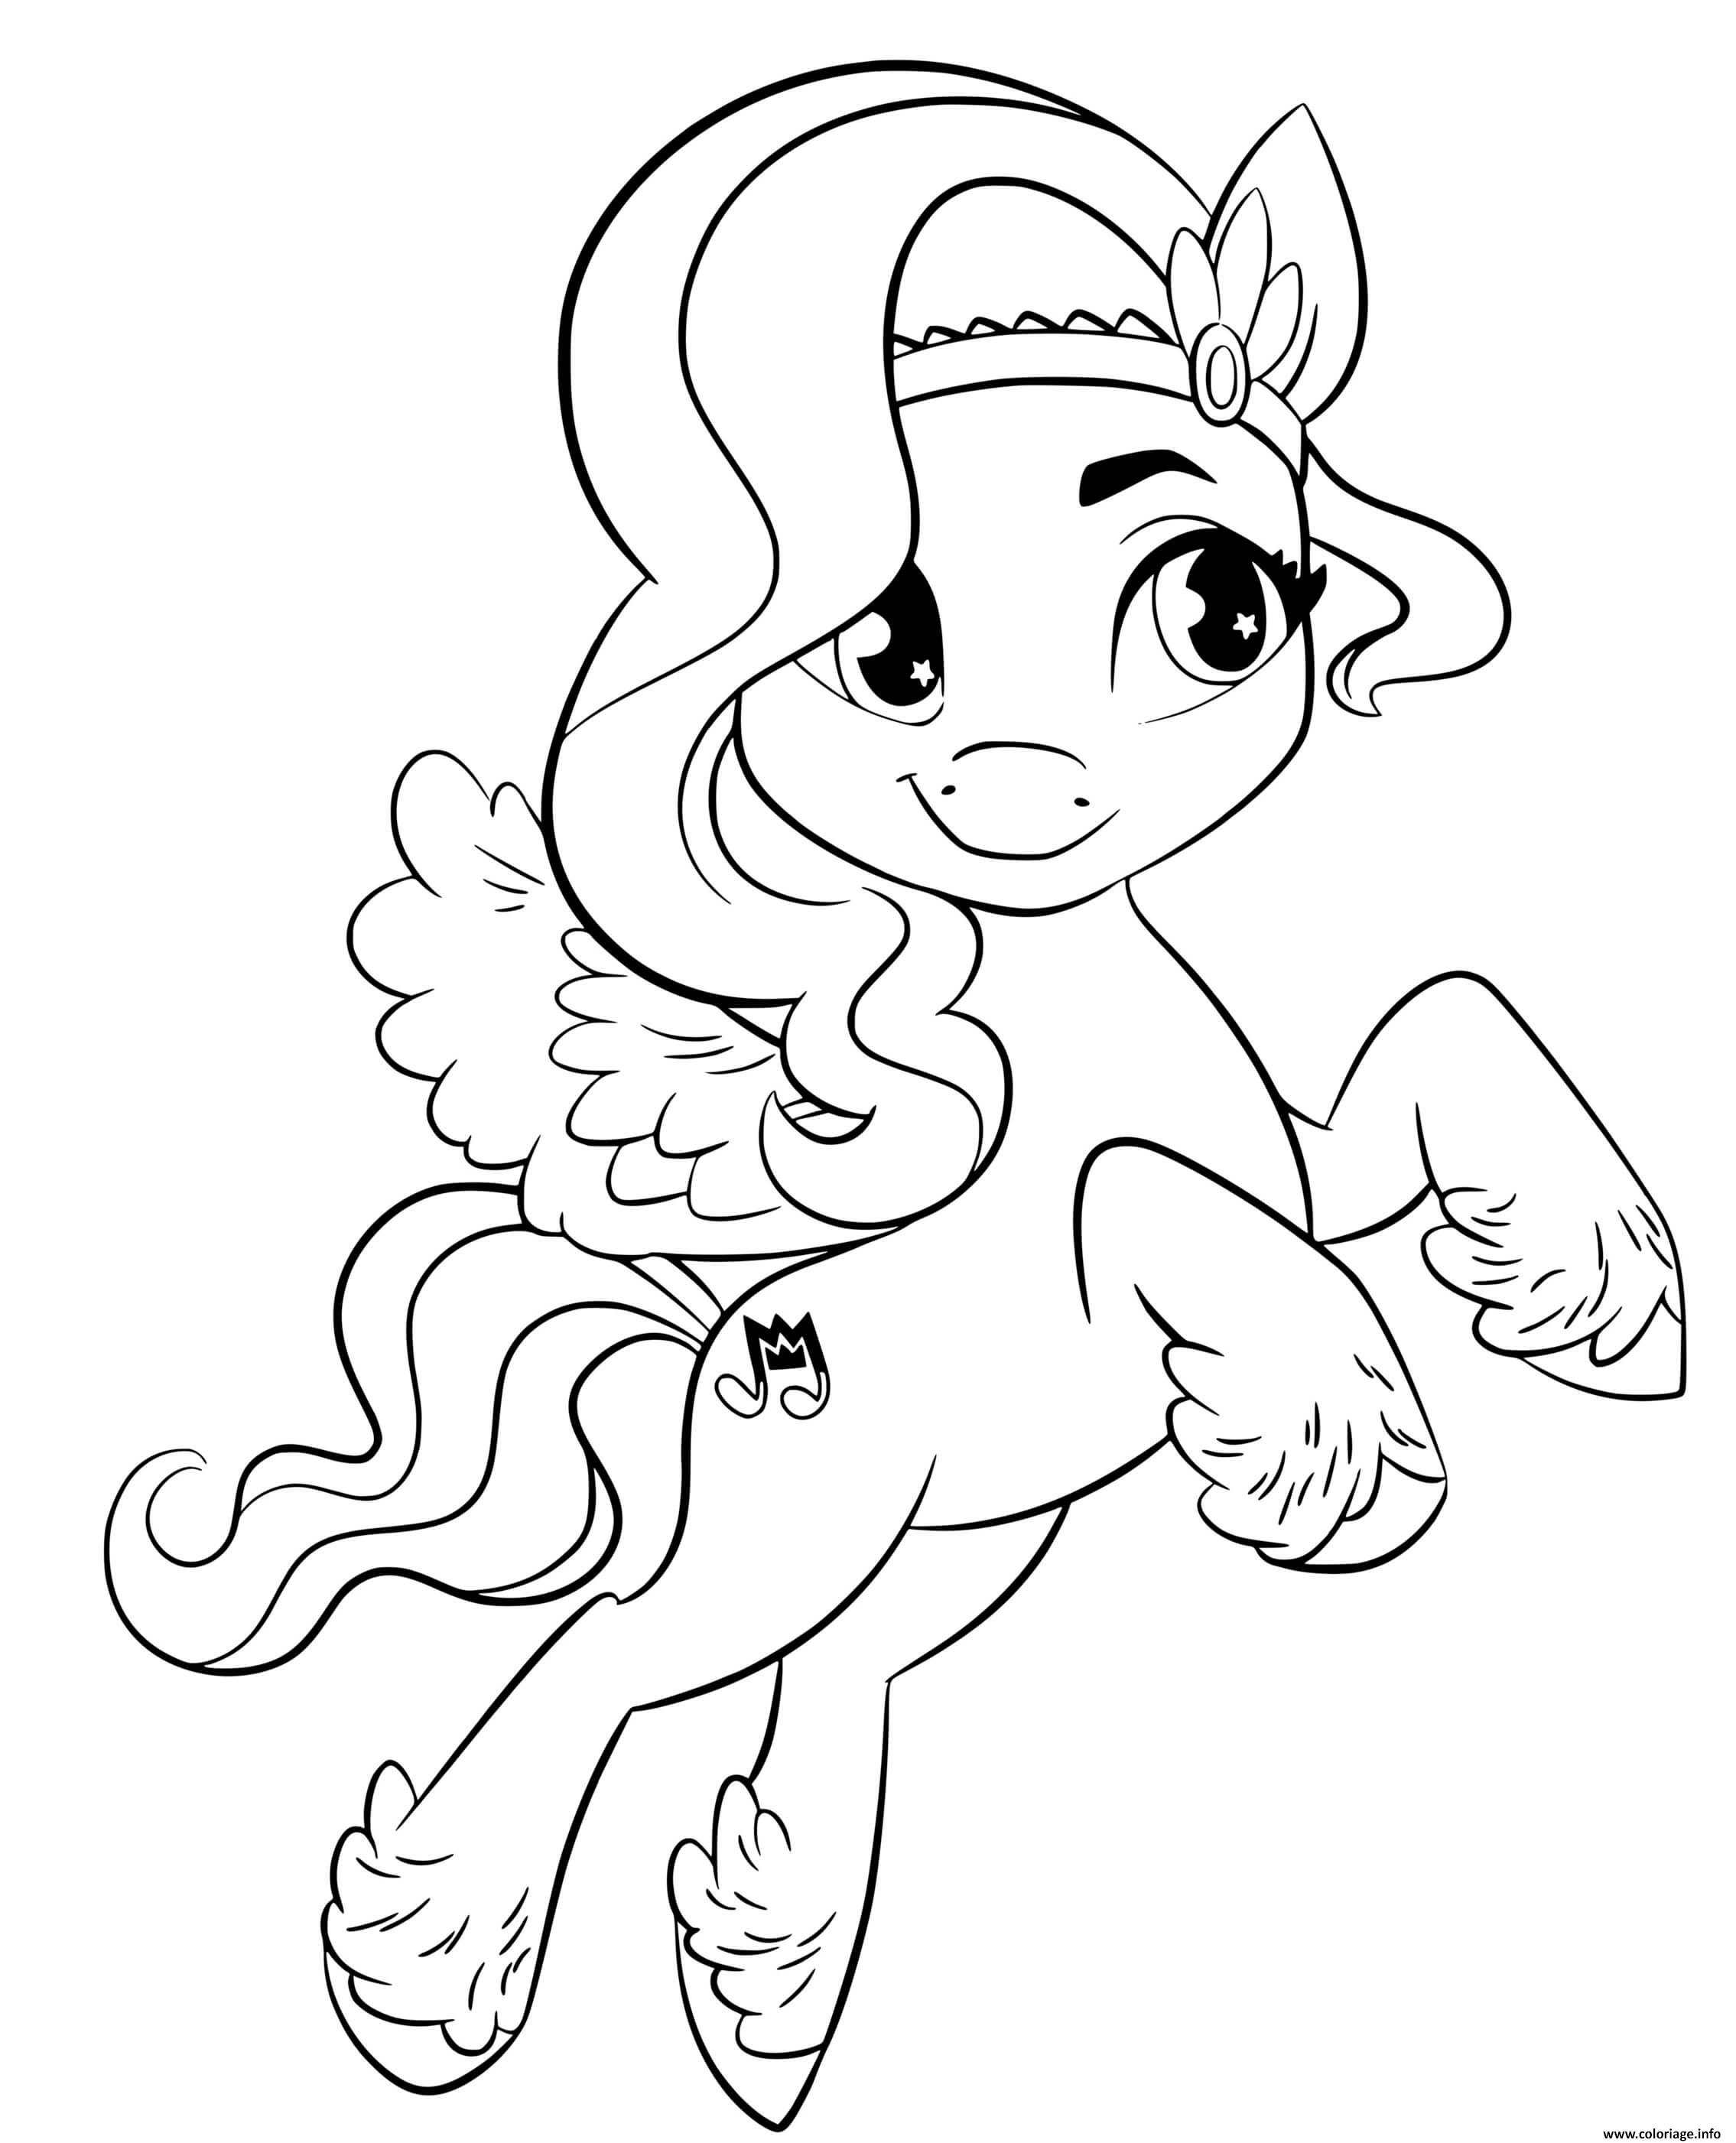 Dessin pipp petals est un poney elegant mlp 5 Coloriage Gratuit à Imprimer